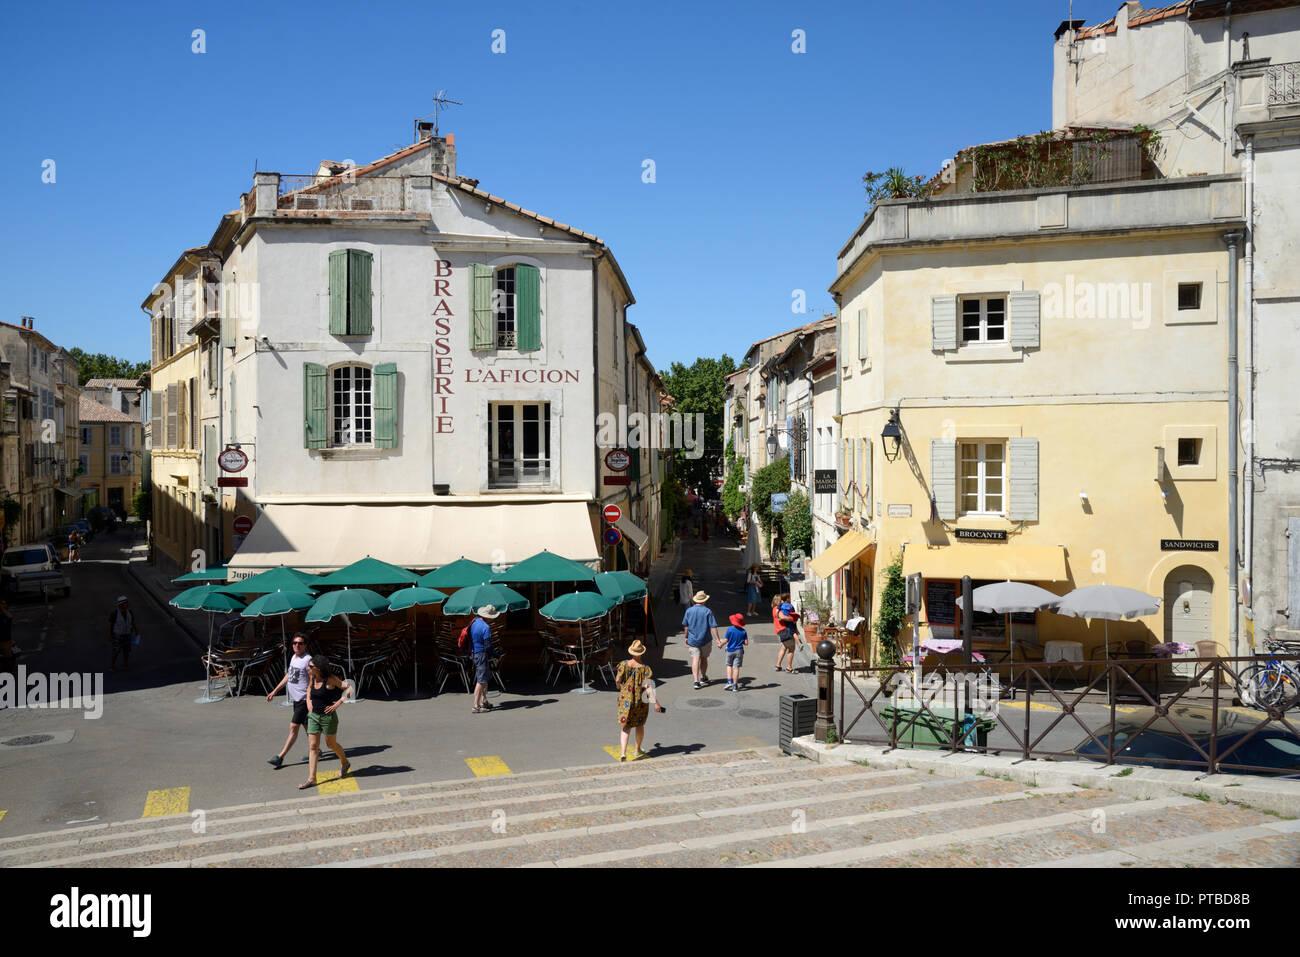 Street Cafes, Sidewalk Cafe, Pavement Cafe & restaurants on Town Square Arles Provence France - Stock Image